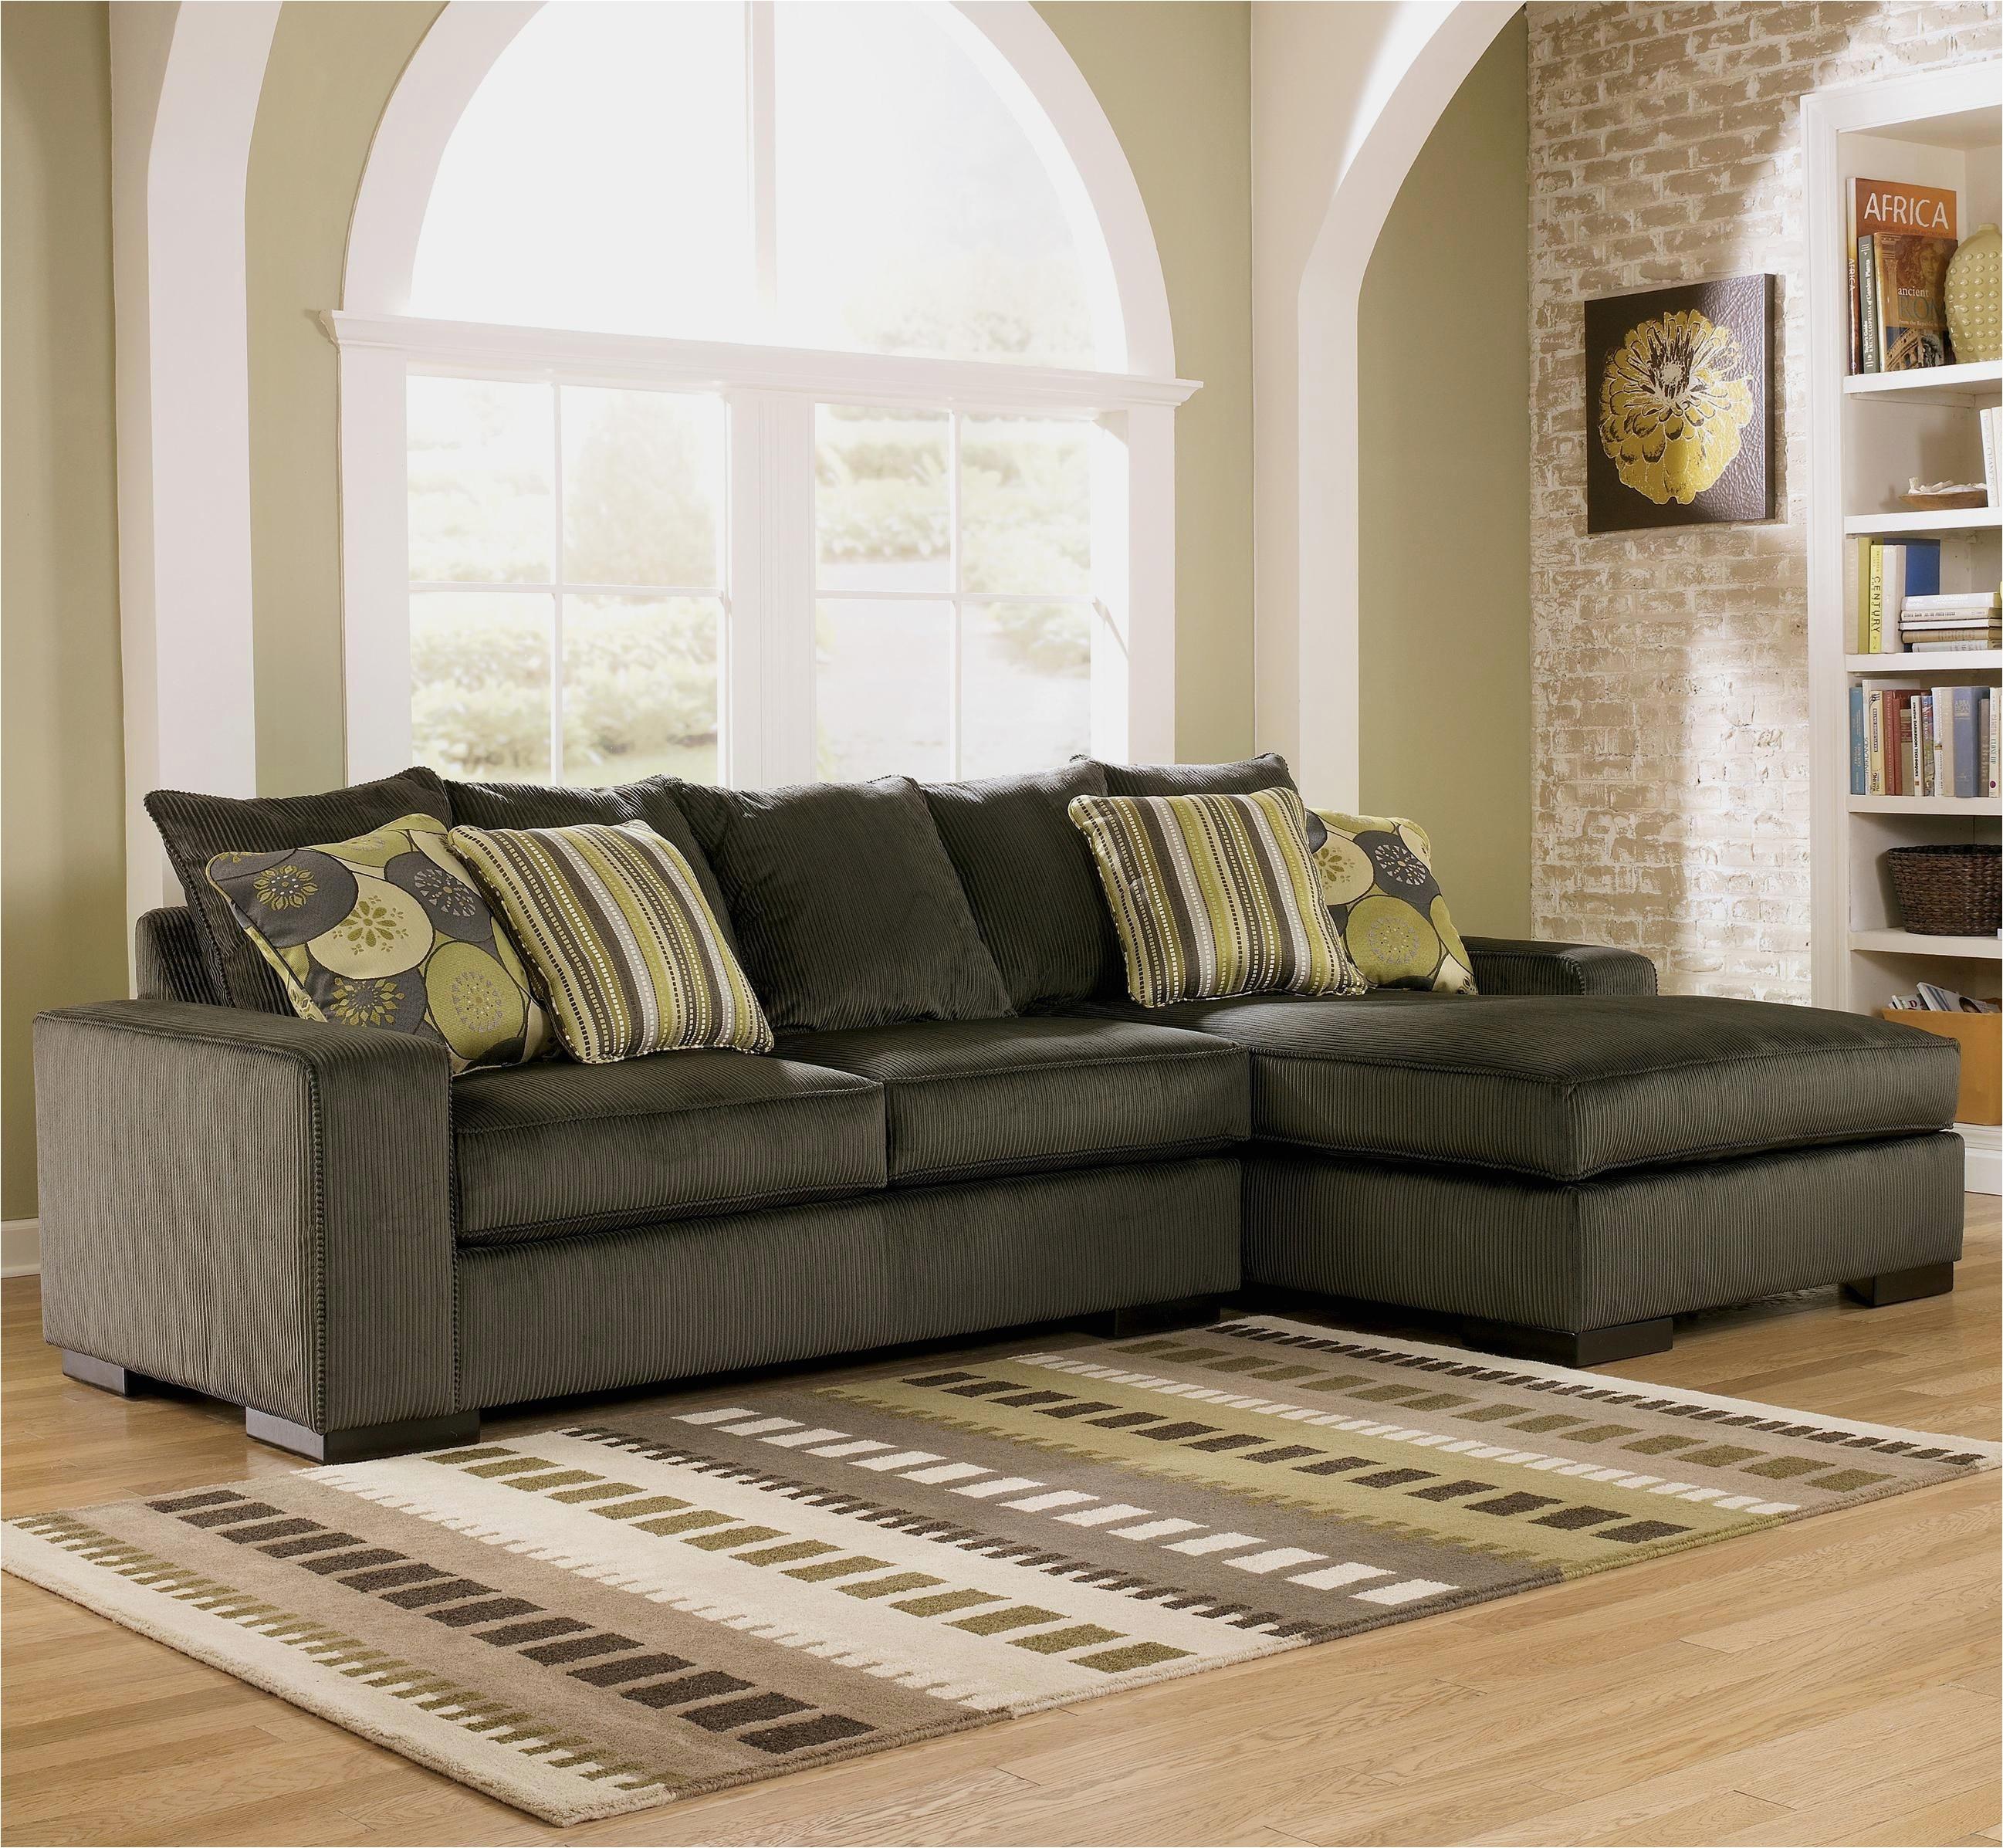 ashley furniture rochester ny fresh webrafi bad credit furniture financing line hillside stock of ashley furniture